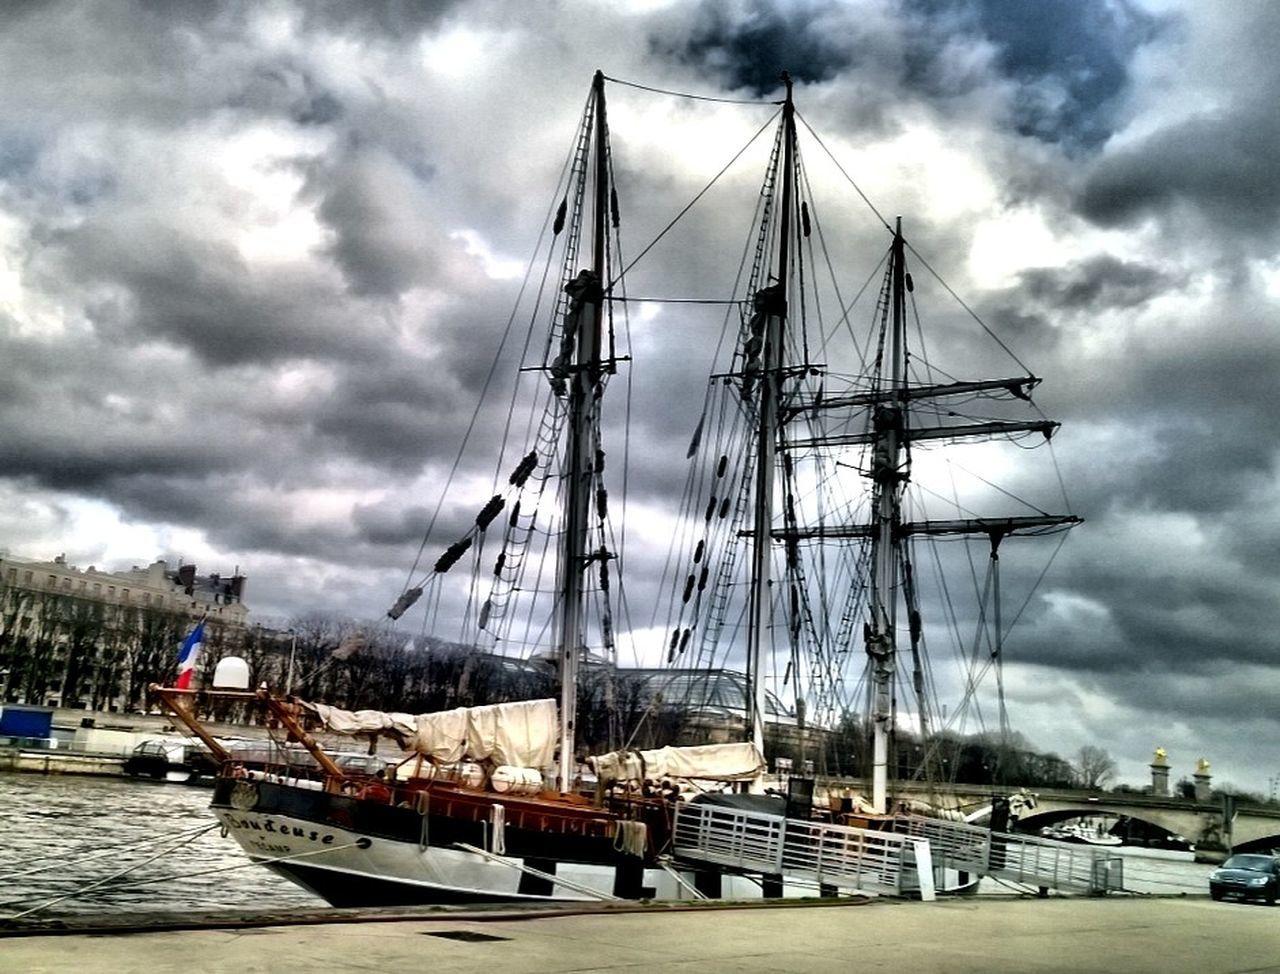 nautical vessel, cloud - sky, transportation, mode of transport, mast, sky, moored, boat, water, sailboat, harbor, sailing ship, outdoors, day, sailing, sea, ship, tall ship, nature, no people, travel destinations, yacht